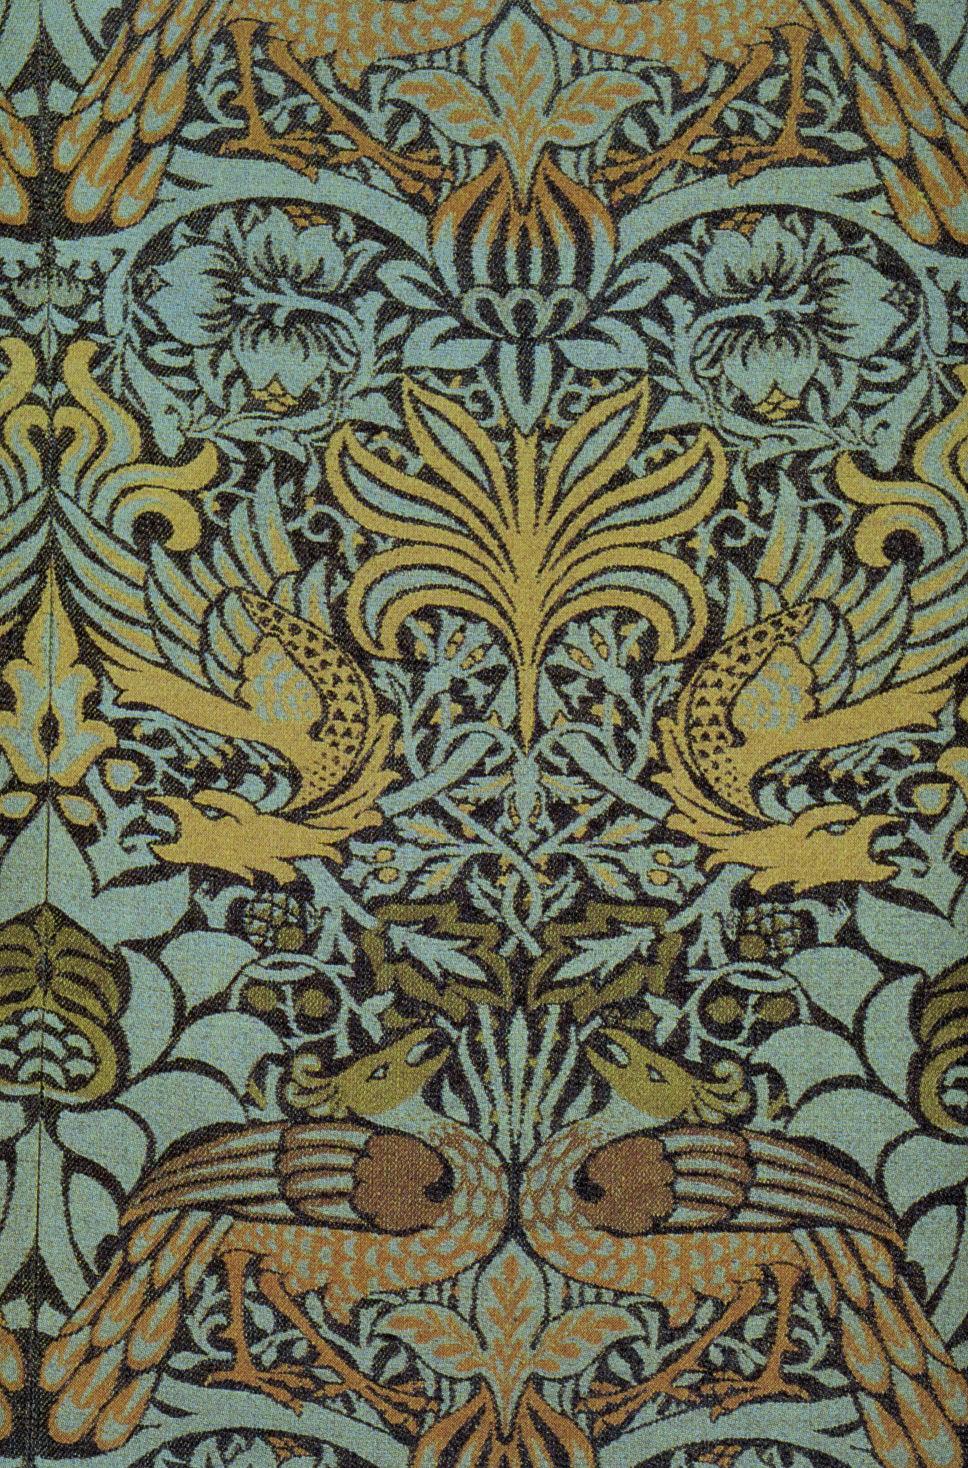 Morris_Peacock_and_Dragon_Fabric_1878_v2.jpg